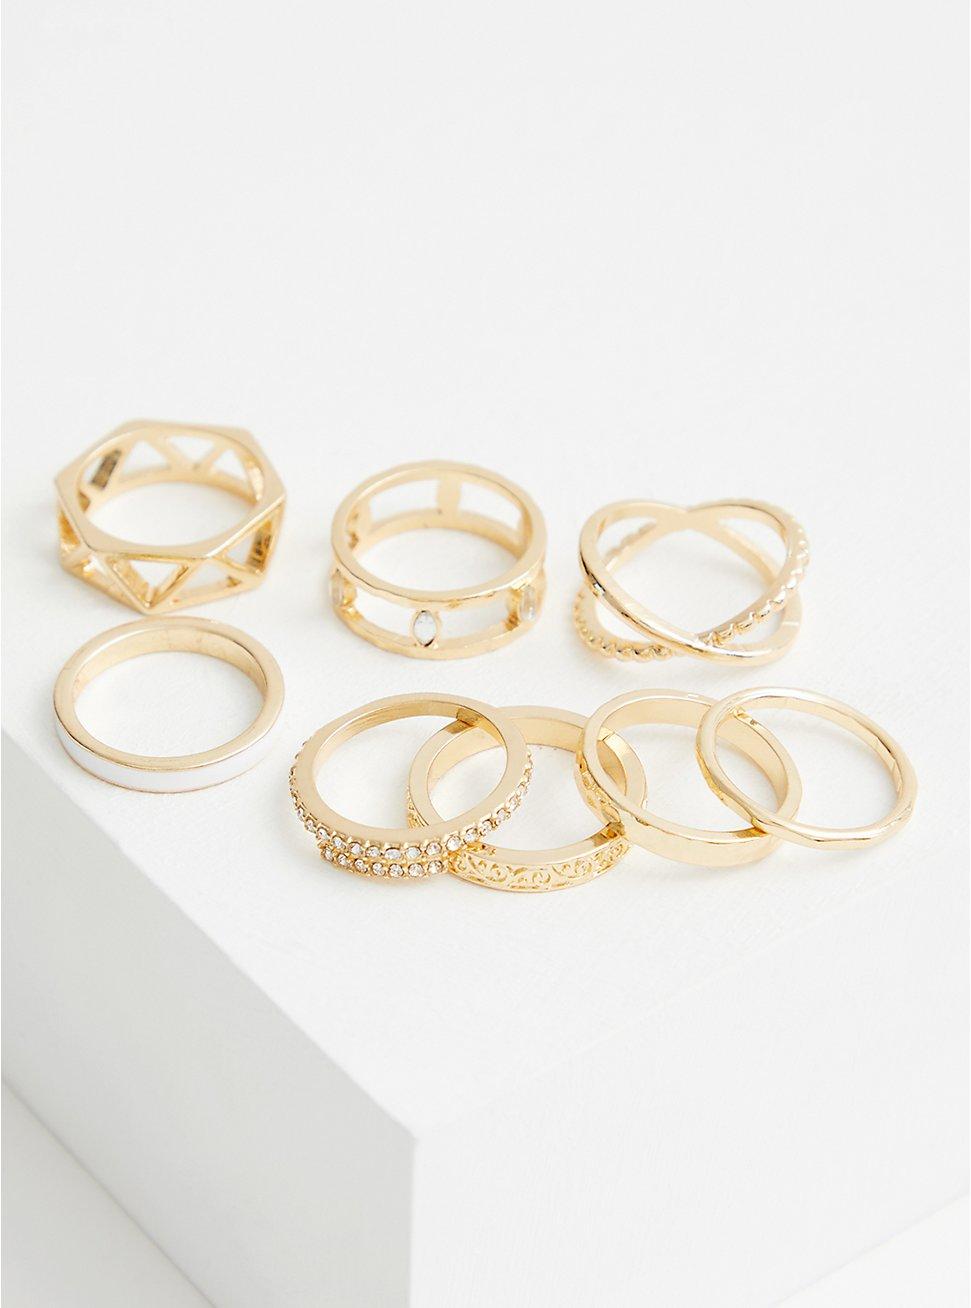 Gold Tone & White Ring Set - Set of 8, WHITE, hi-res